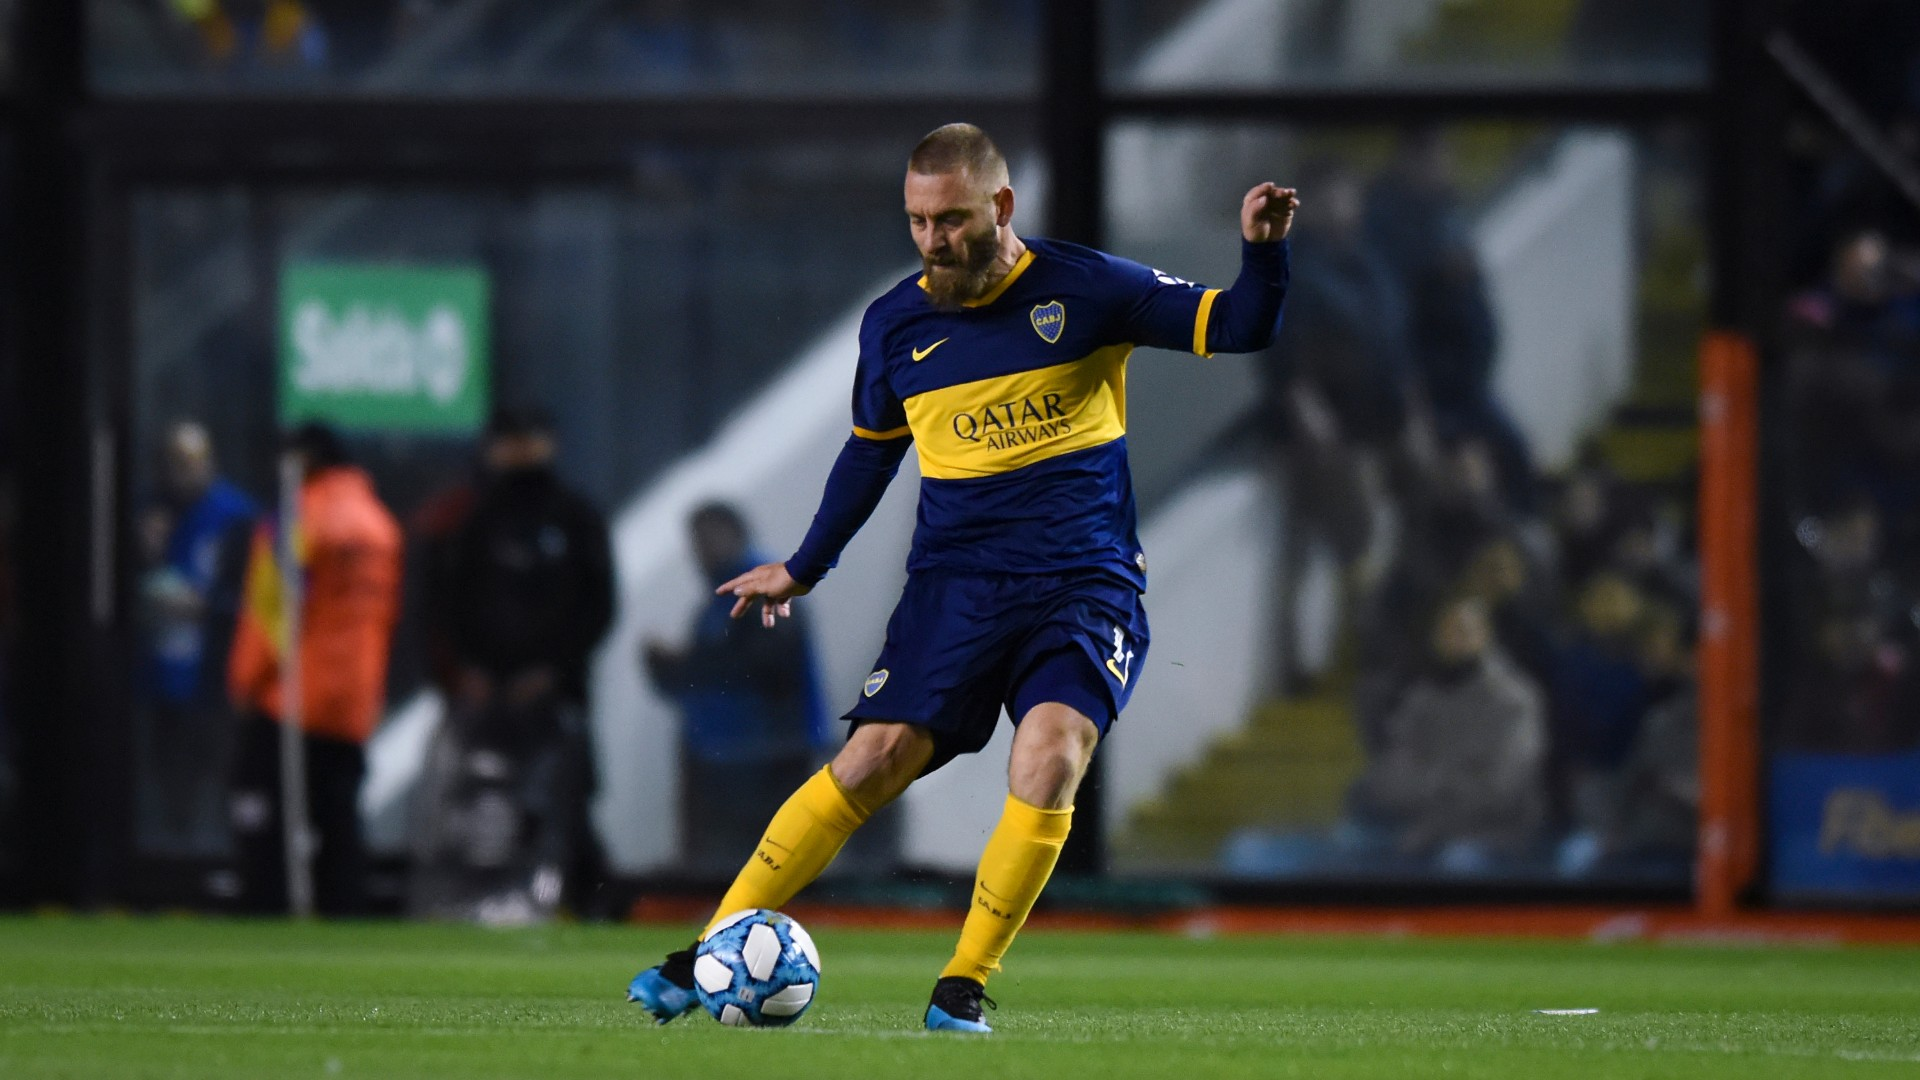 Boca Juniors, esordio vincente per De Rossi alla Bombonera: 2-0 all'Aldovisi